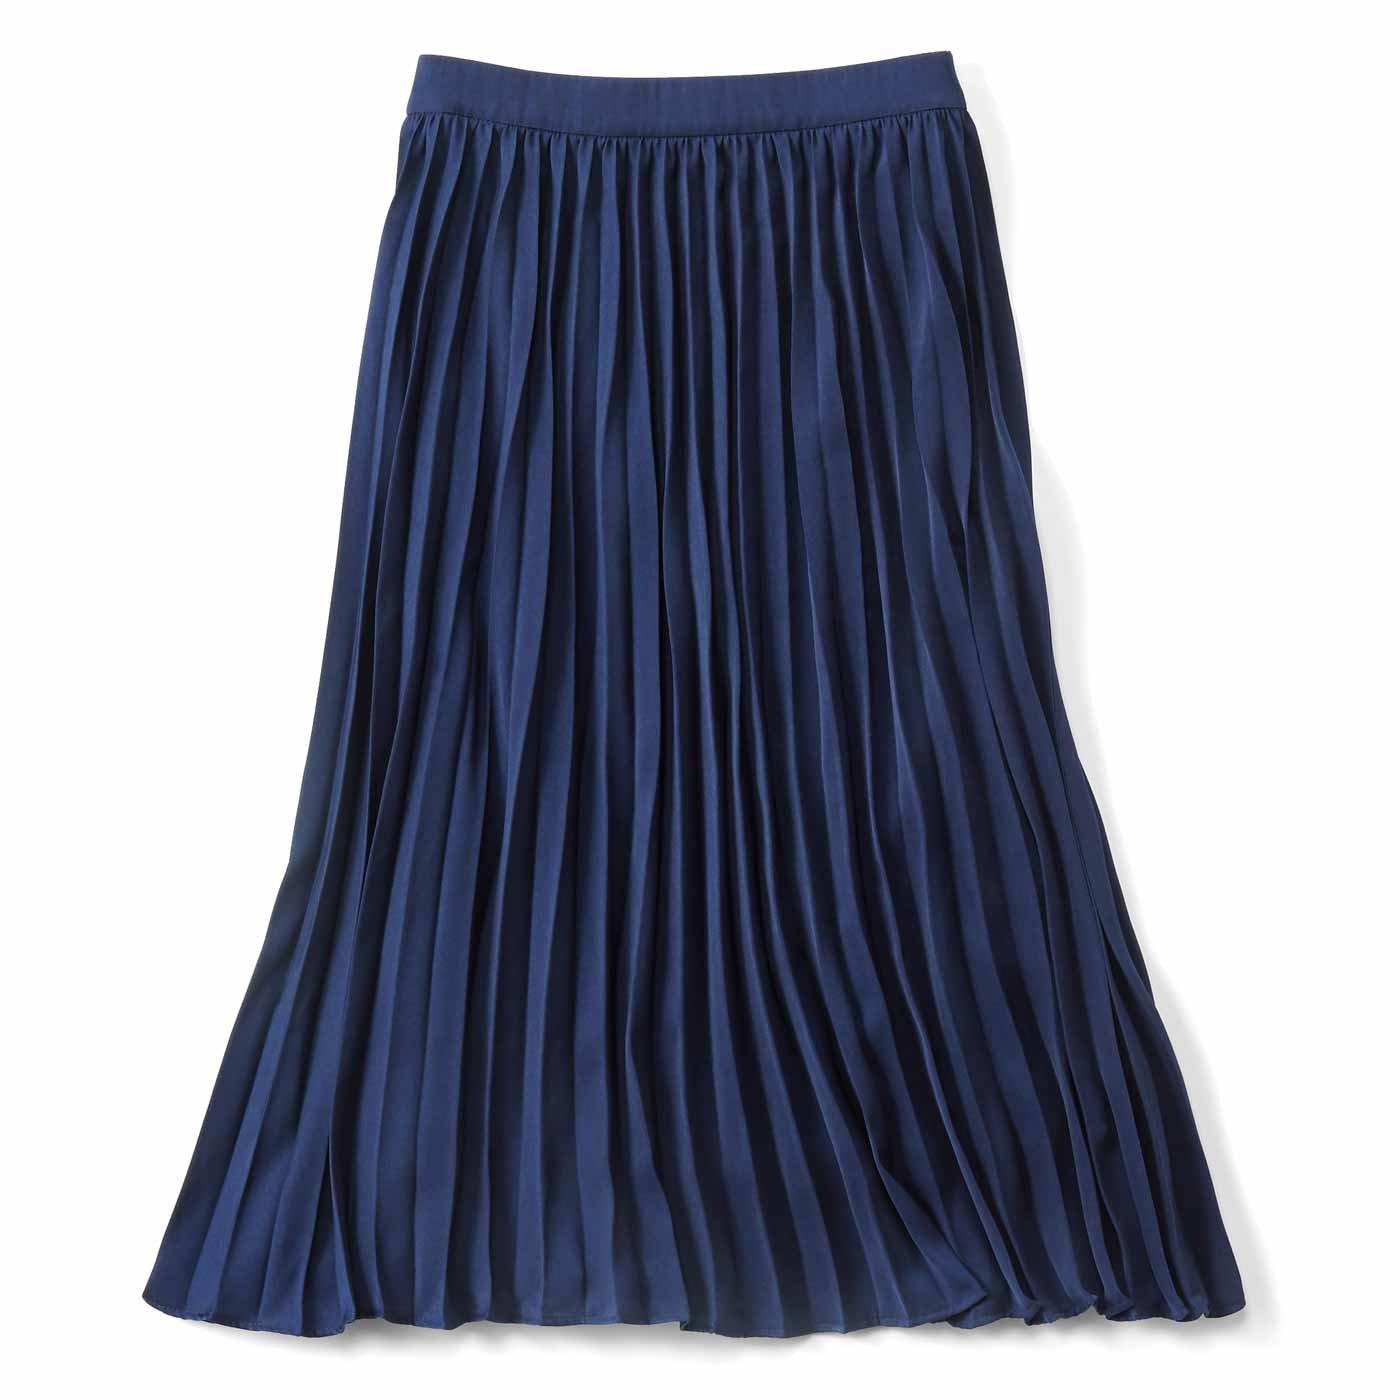 IEDIT[イディット] 軽やかさを演出する 大人のプリーツスカート〈ネイビー〉